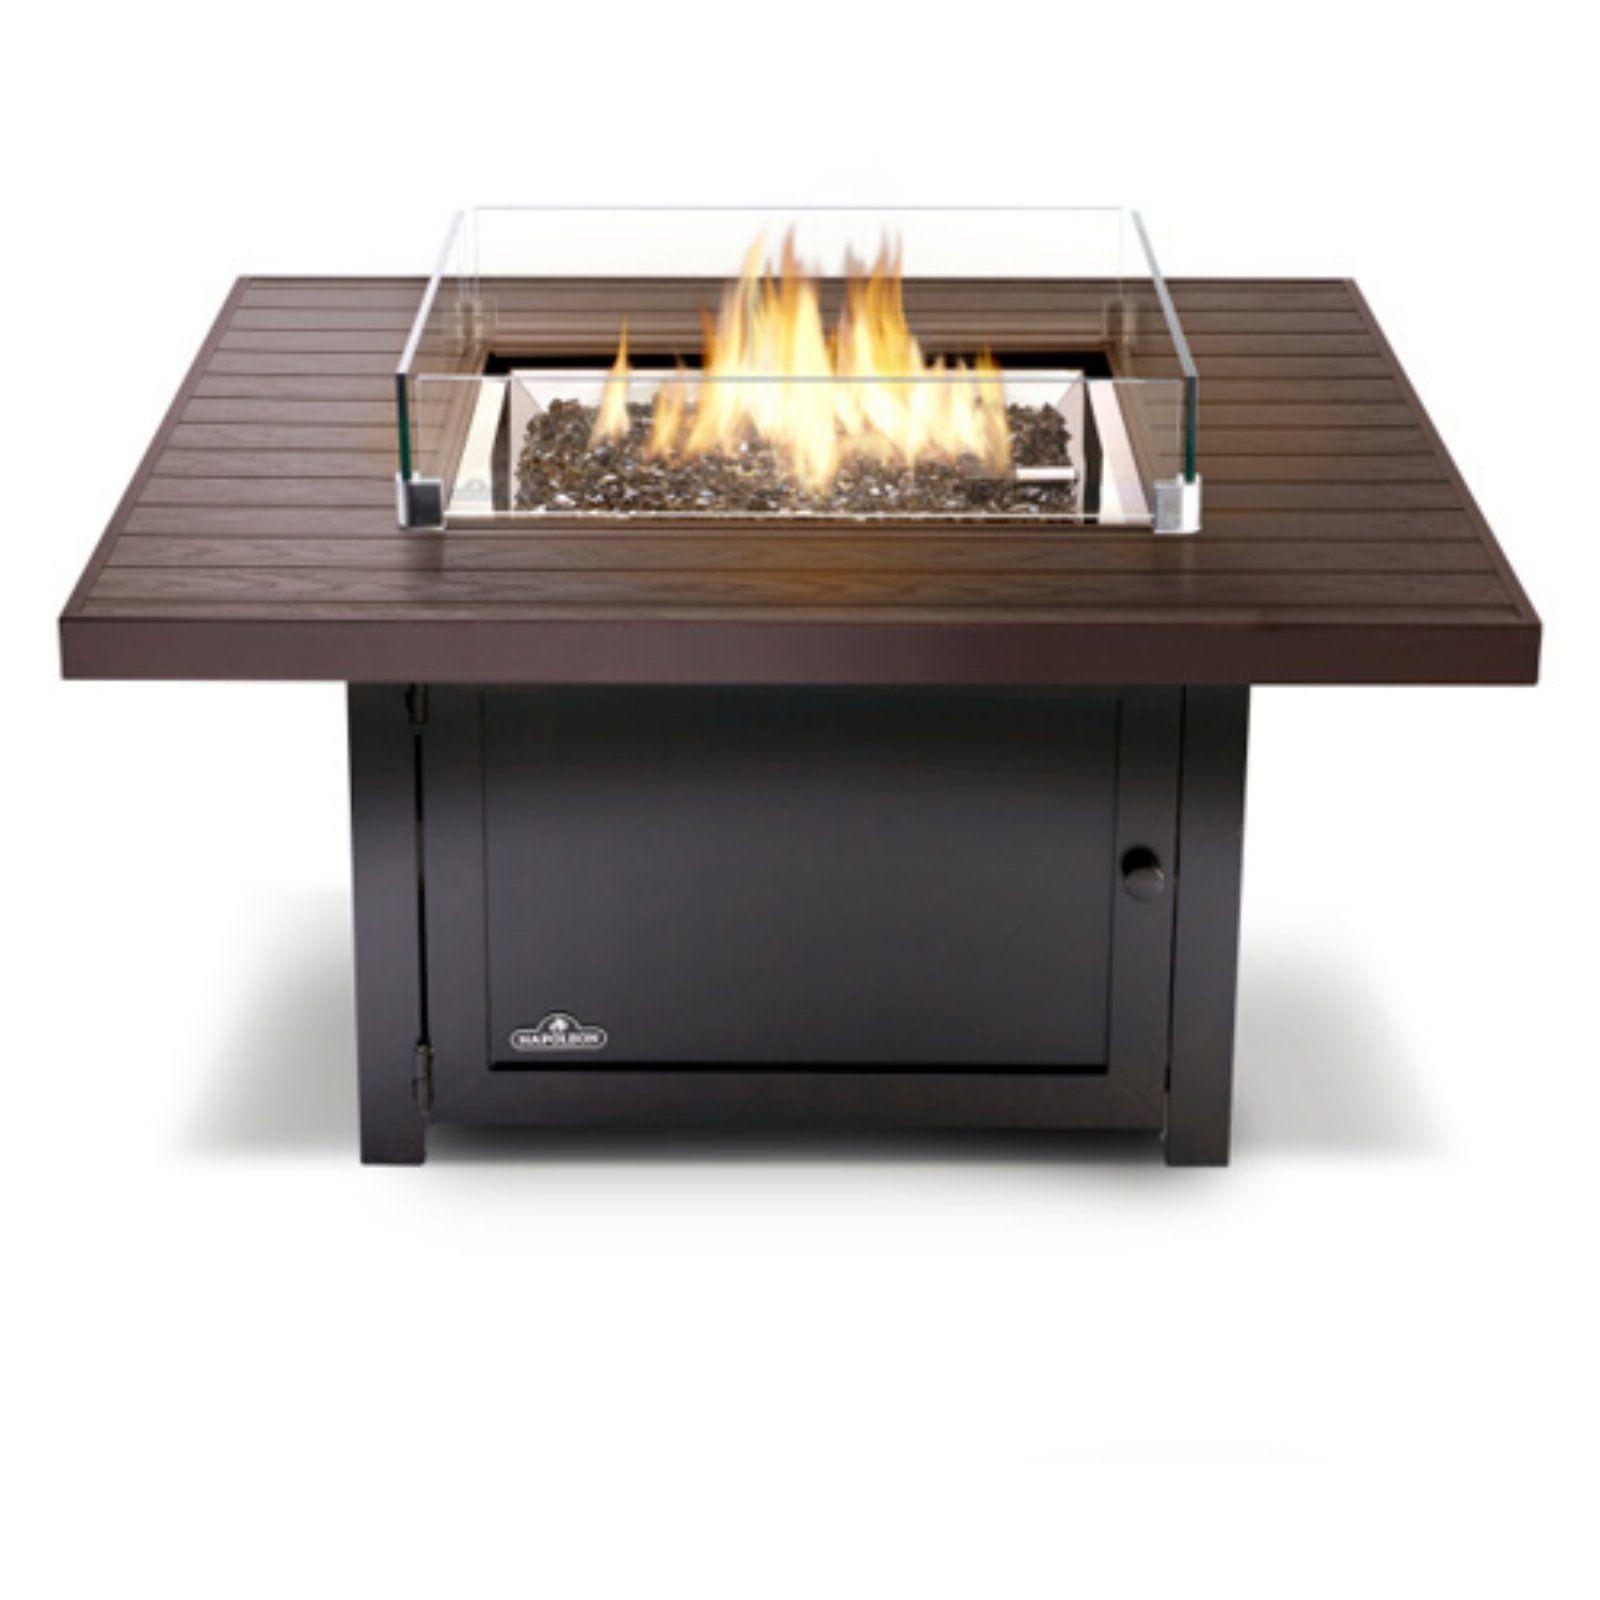 Napoleon Muskoka Square Patioflame Fire Pit Table | Fire ...